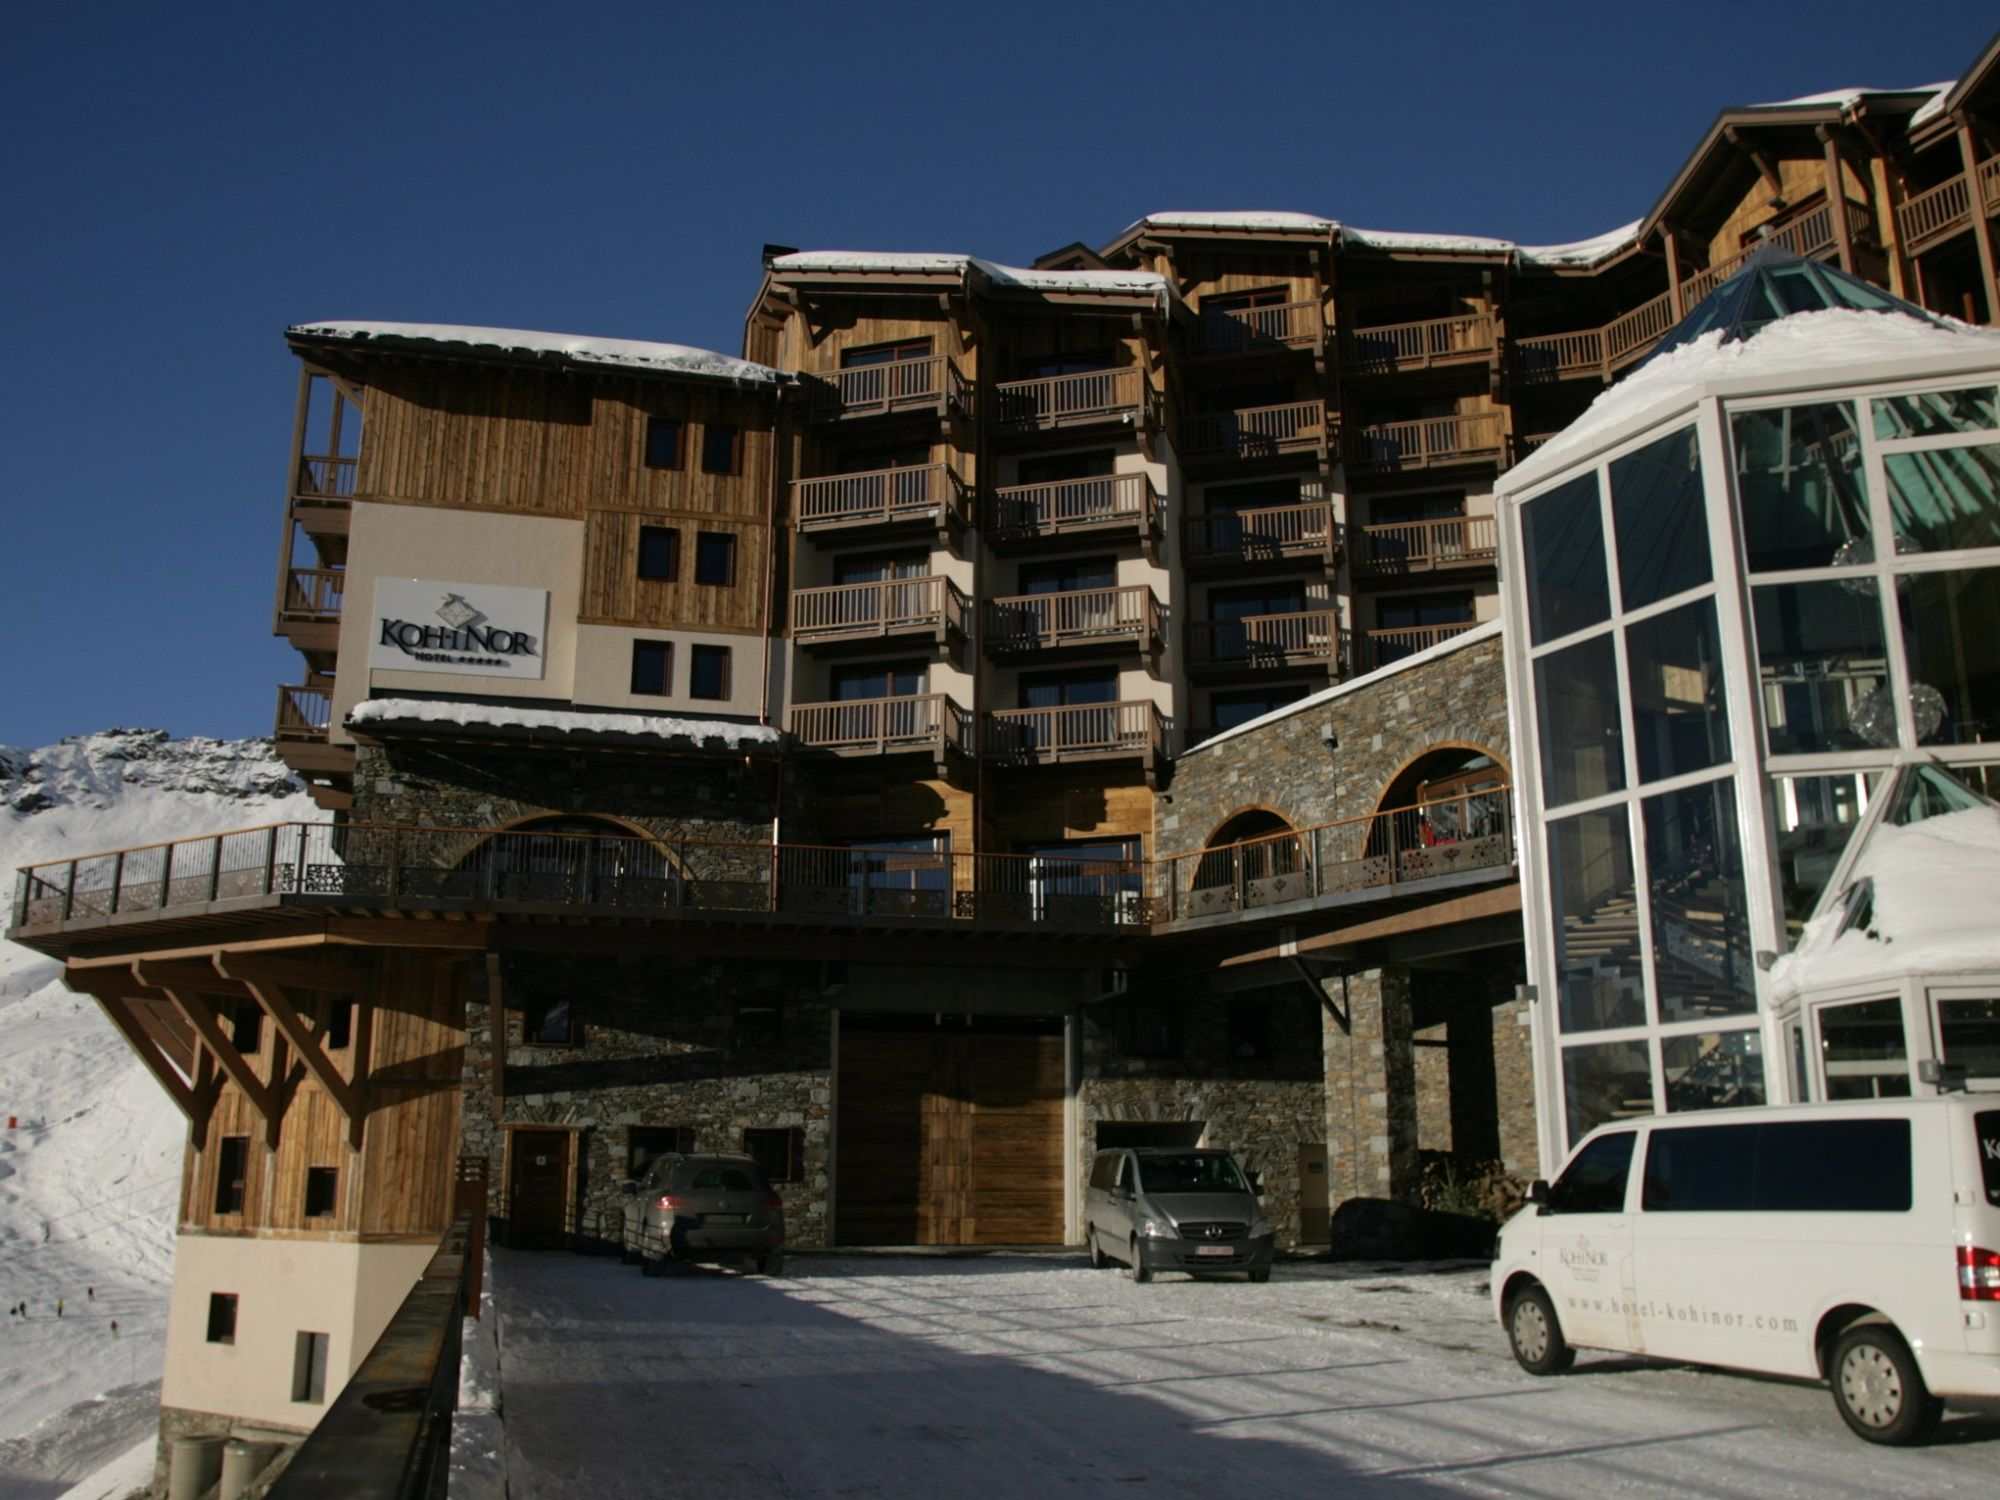 Chalet-appartement Koh-i Nor type B - 49 m² - 4 personen